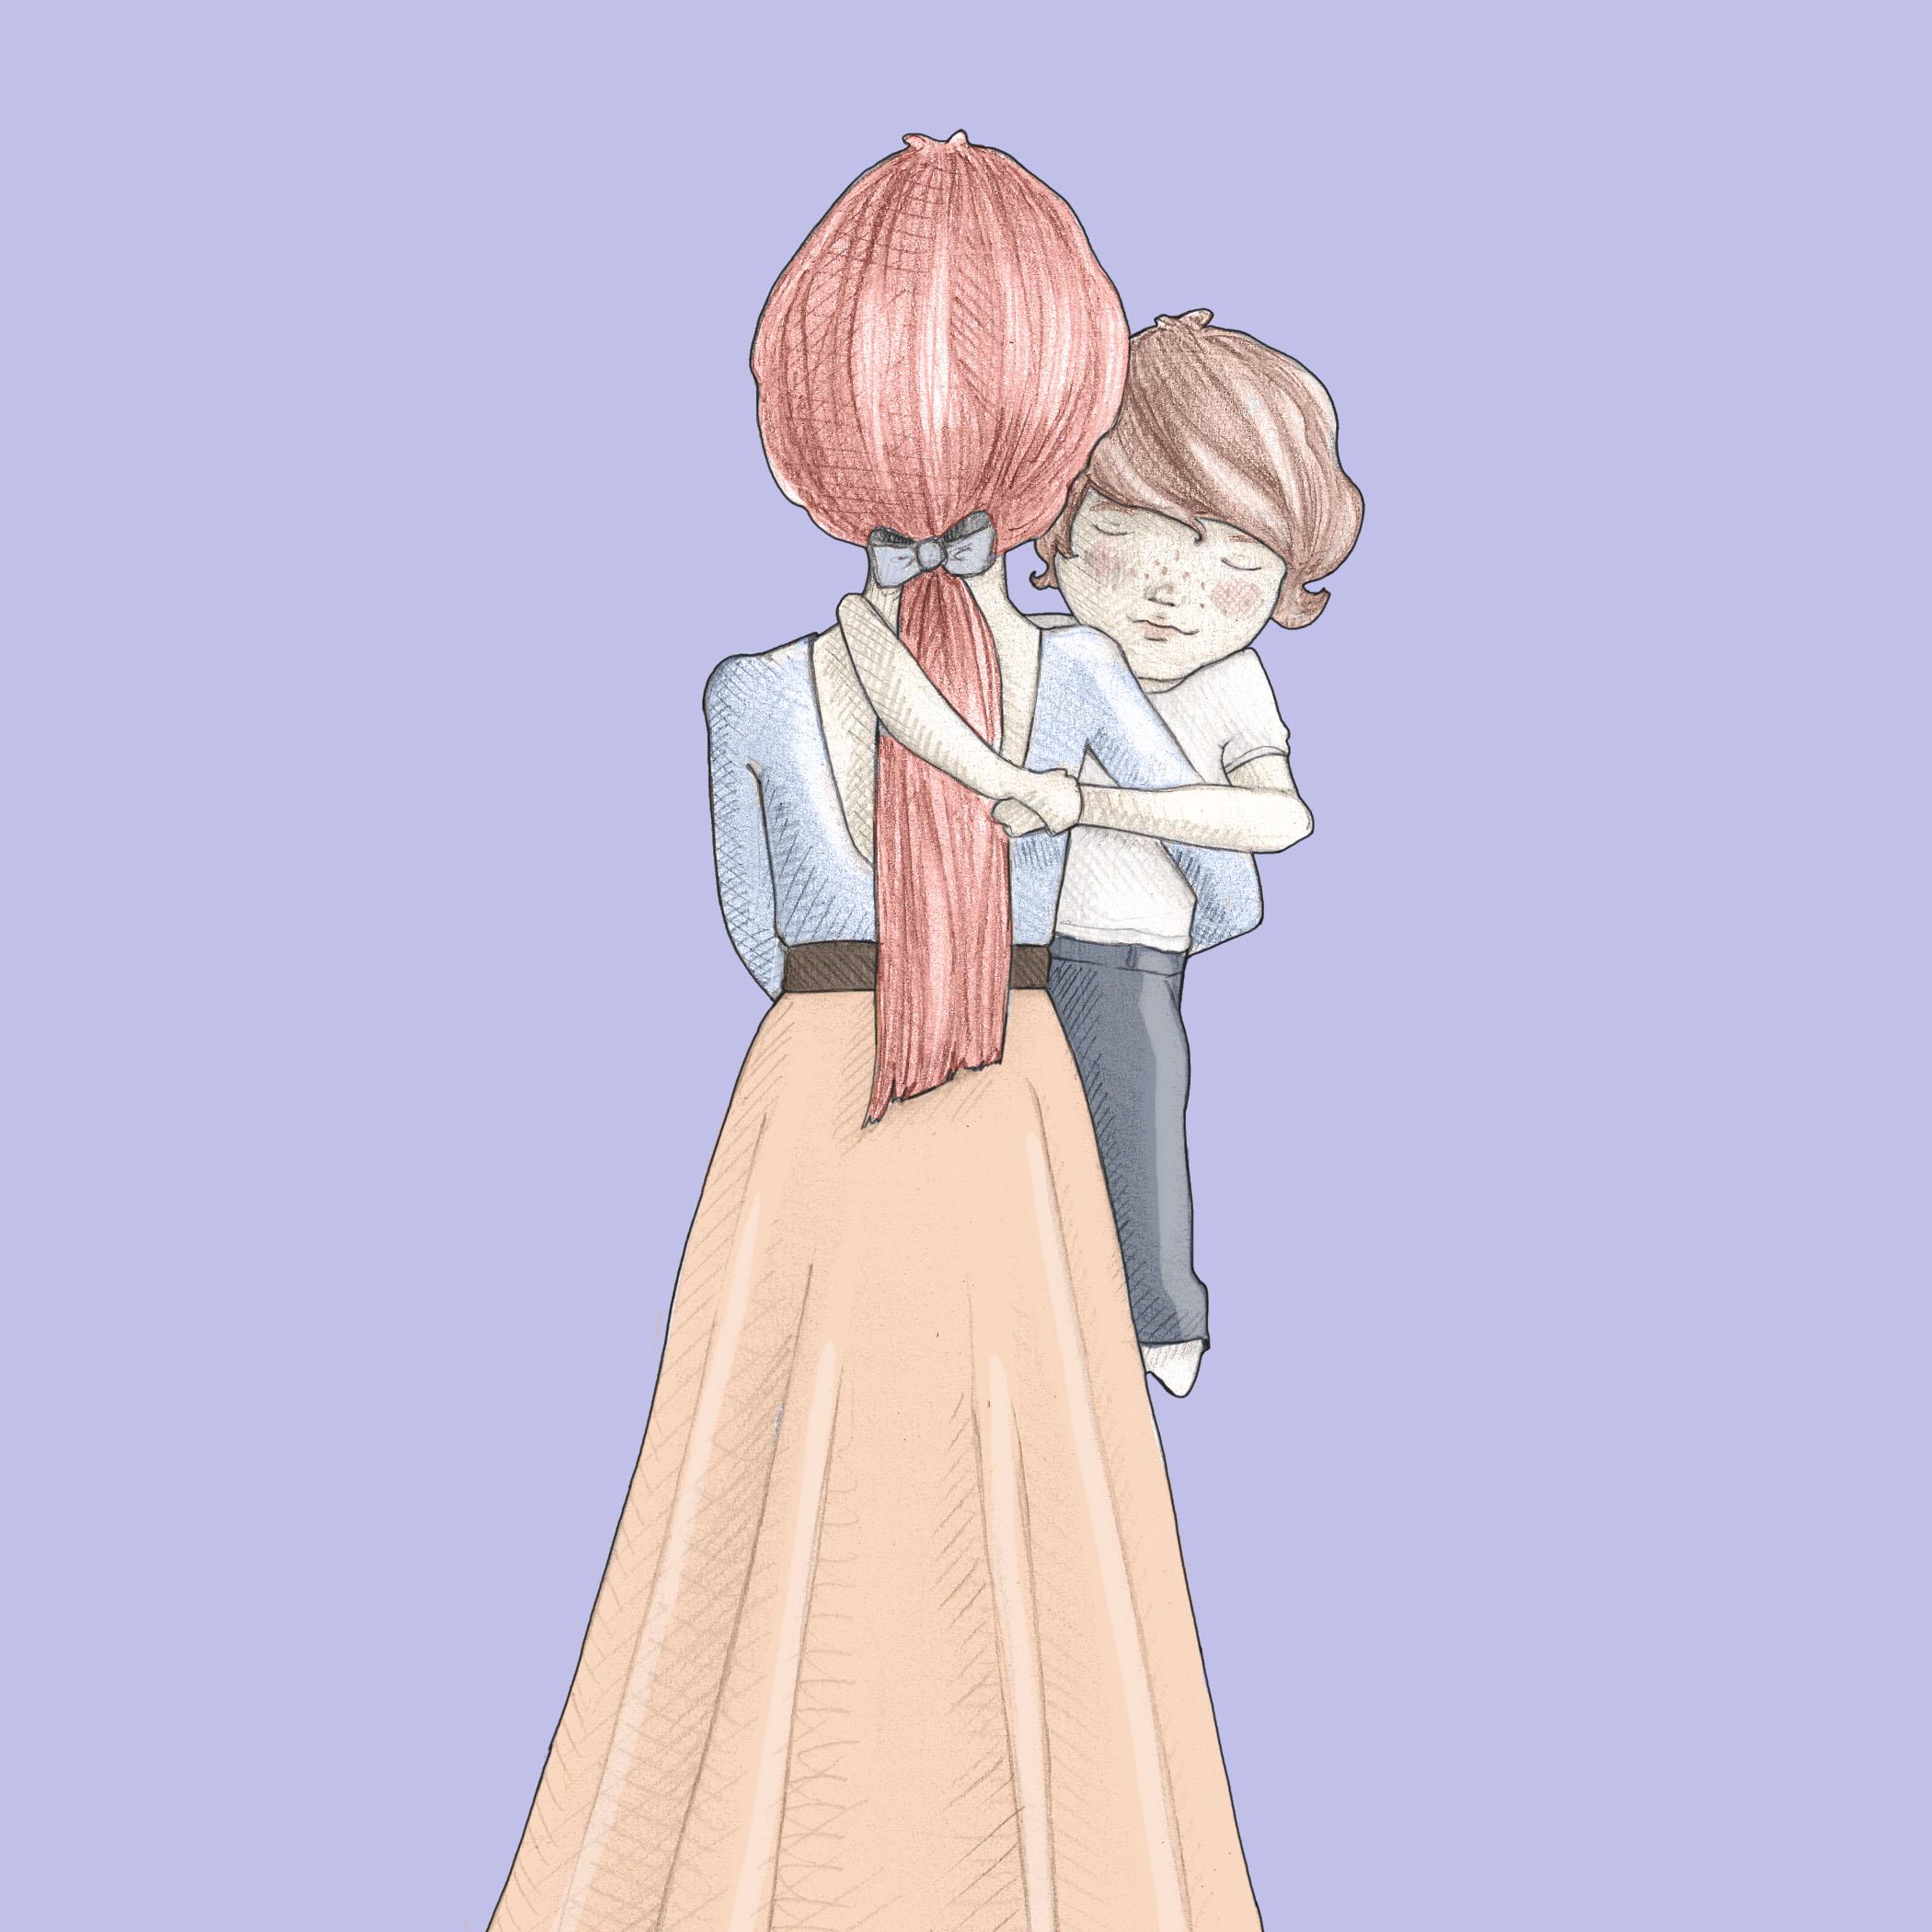 I am a hugger